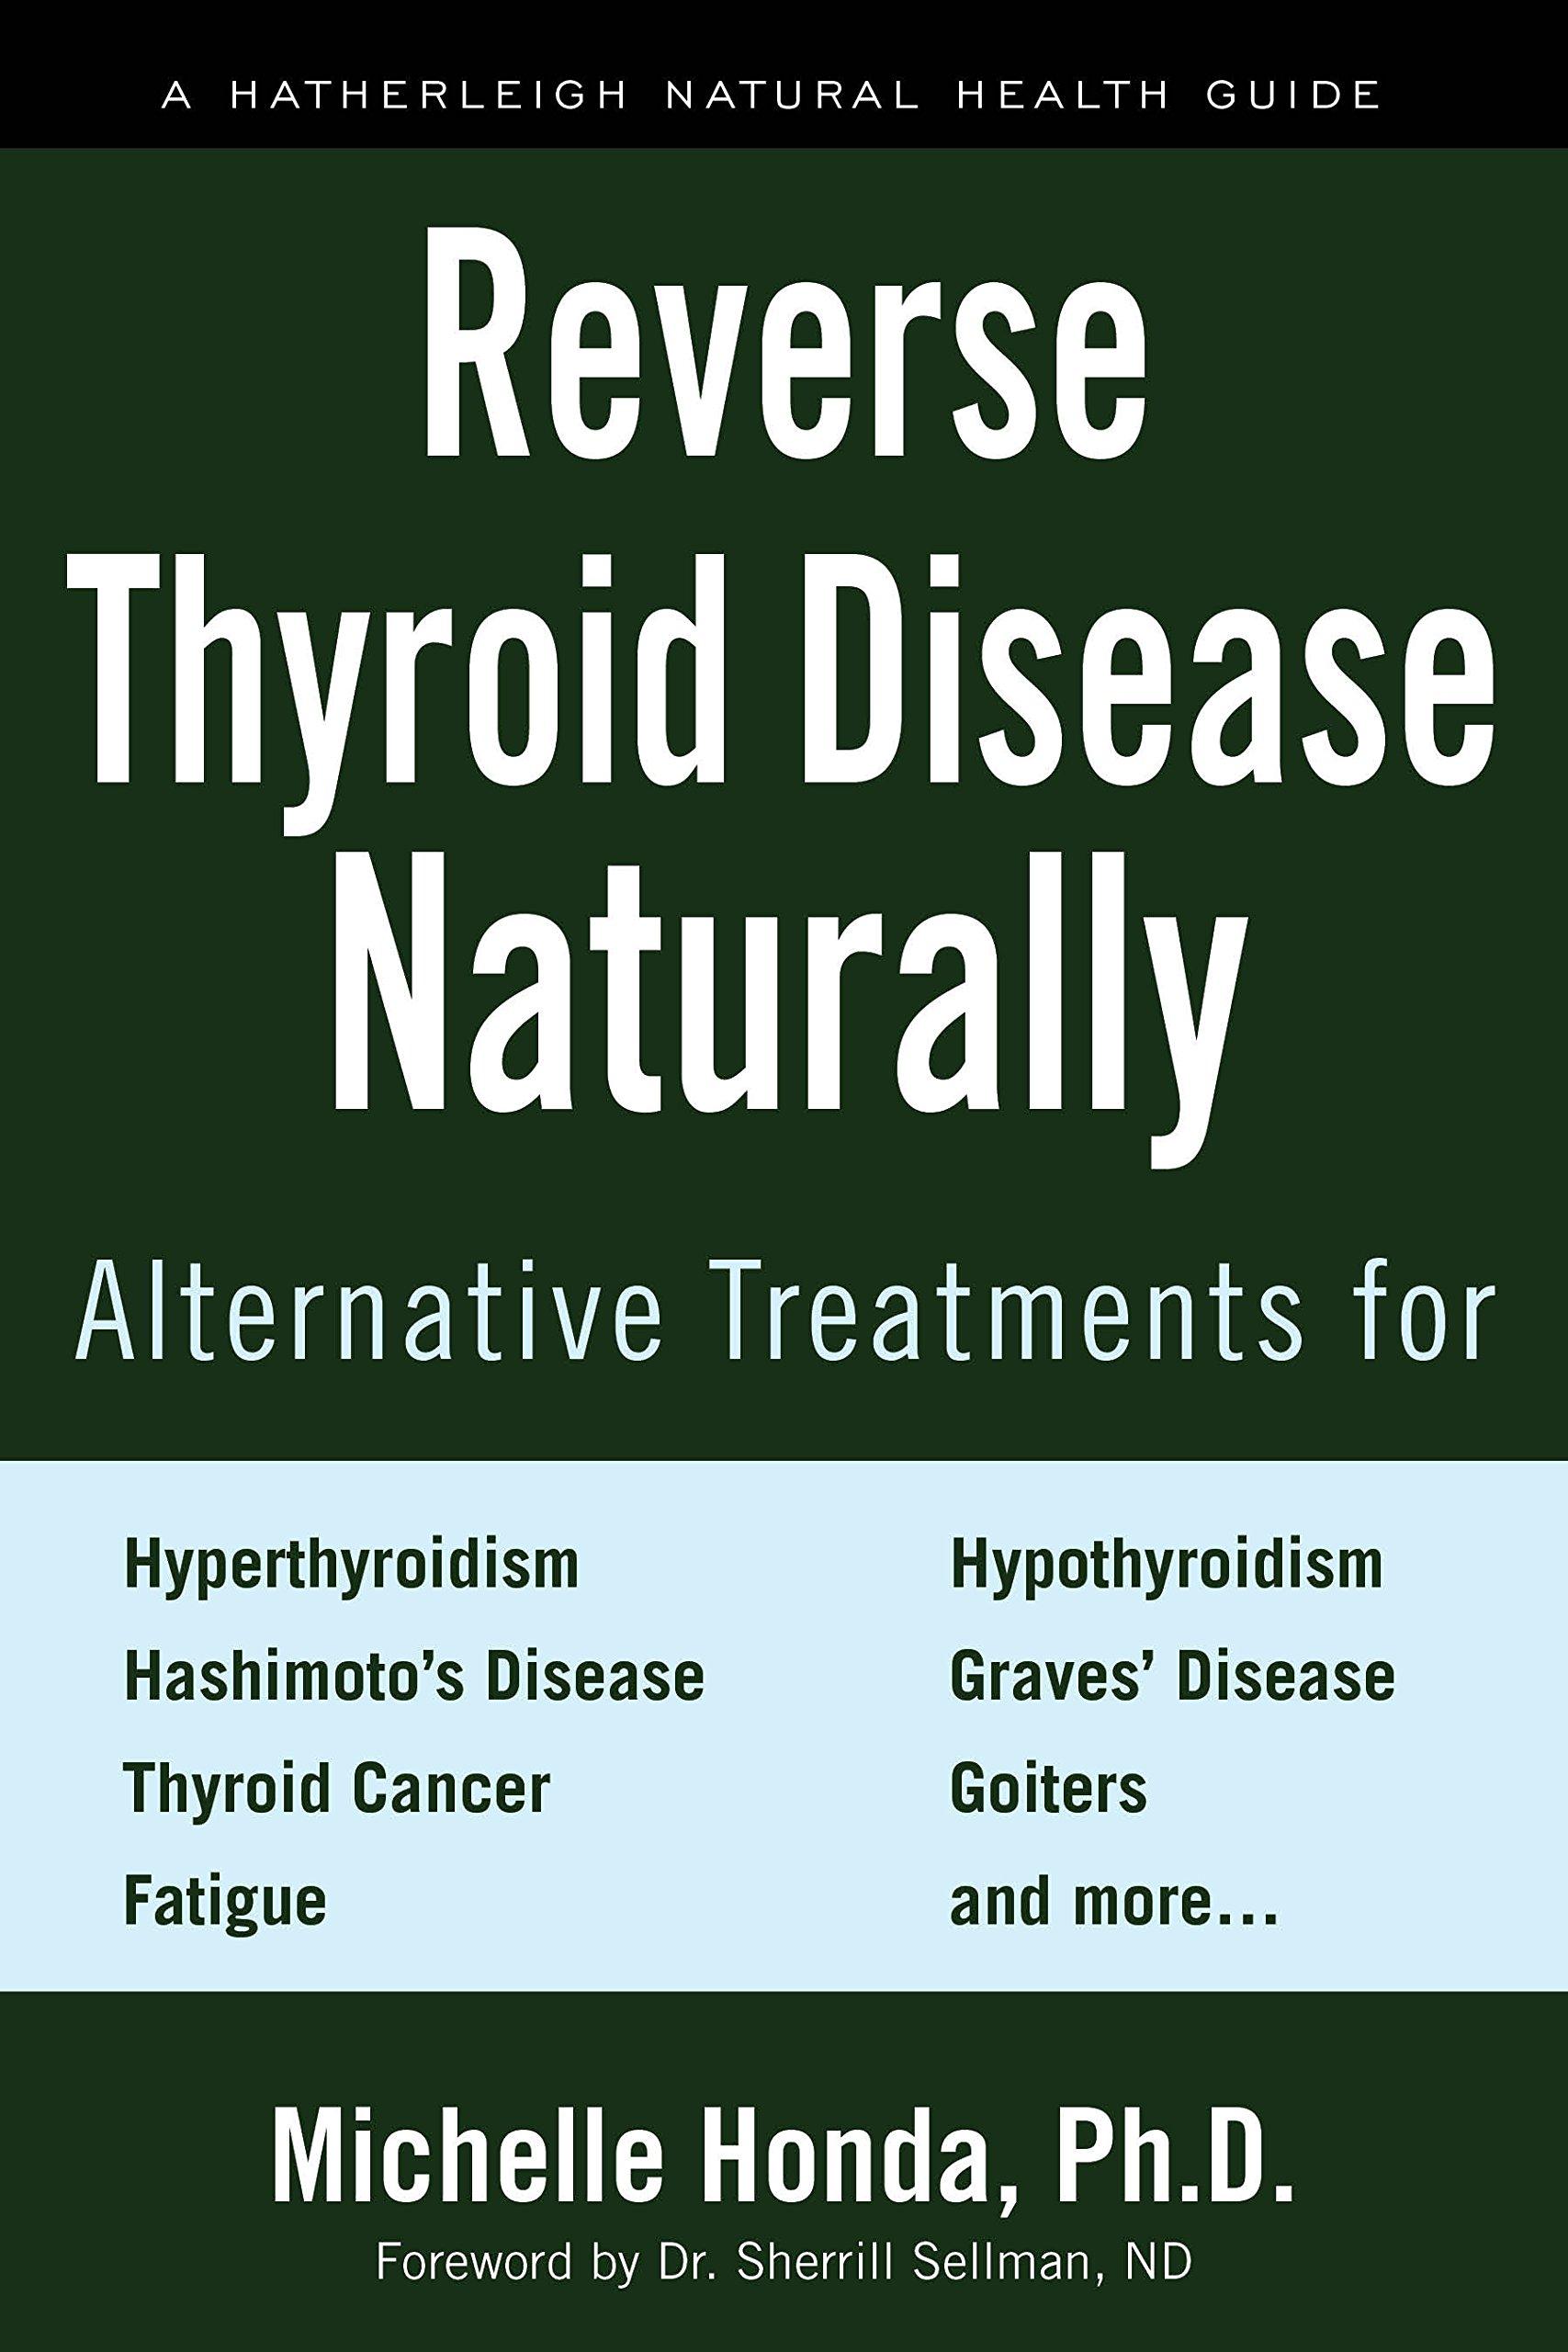 Reverse Thyroid Disease Naturally Alternative Treatments For Hyperthyroidism Hypothyroidism Hashimoto S Disease Graves Disease Thyroid Cancer And More Hatherleigh Natural Health Guides Honda Michelle Sellman Dr Sherrill 9781578267569